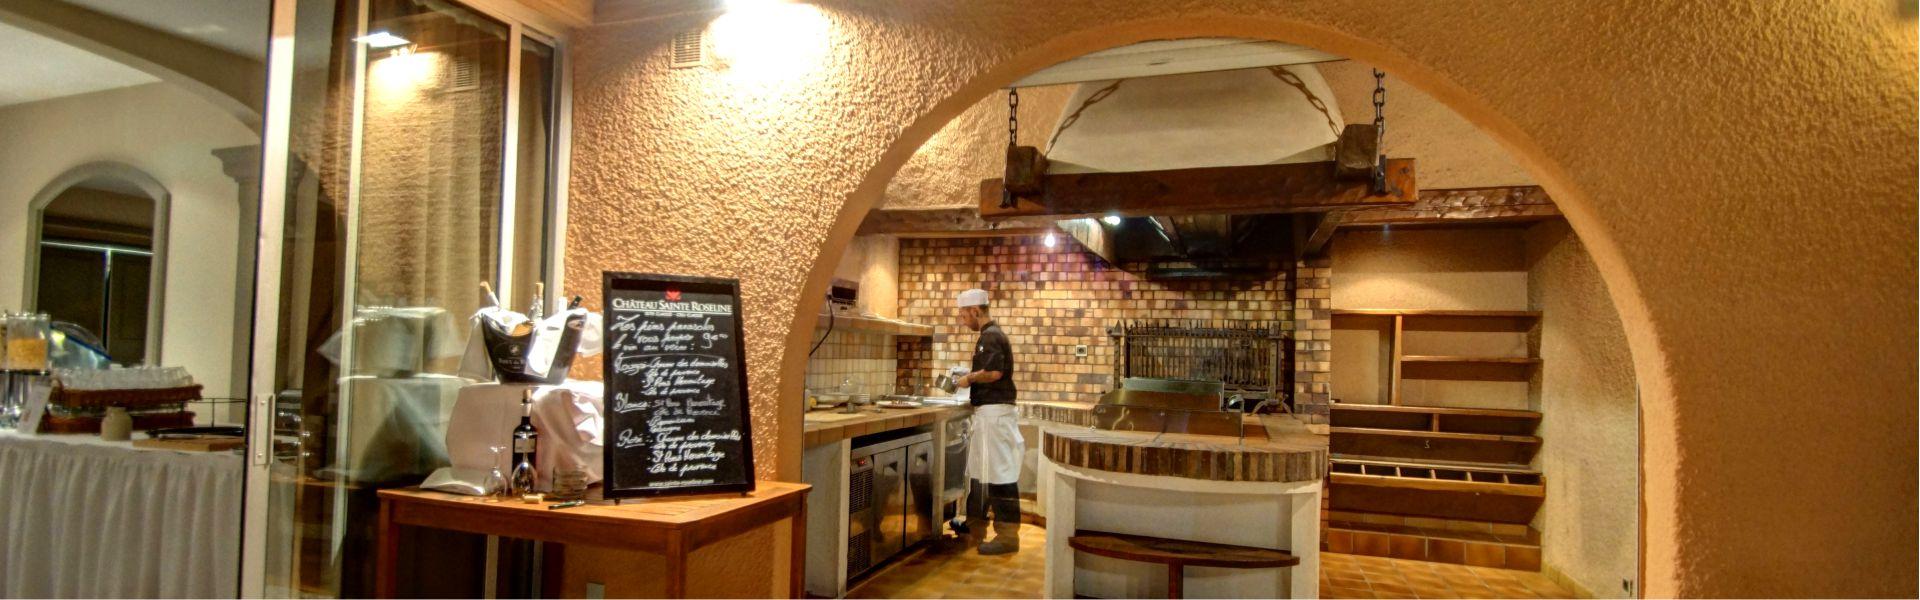 Grill et cuisinier du restaurant Najeti Les Pins Parasols.